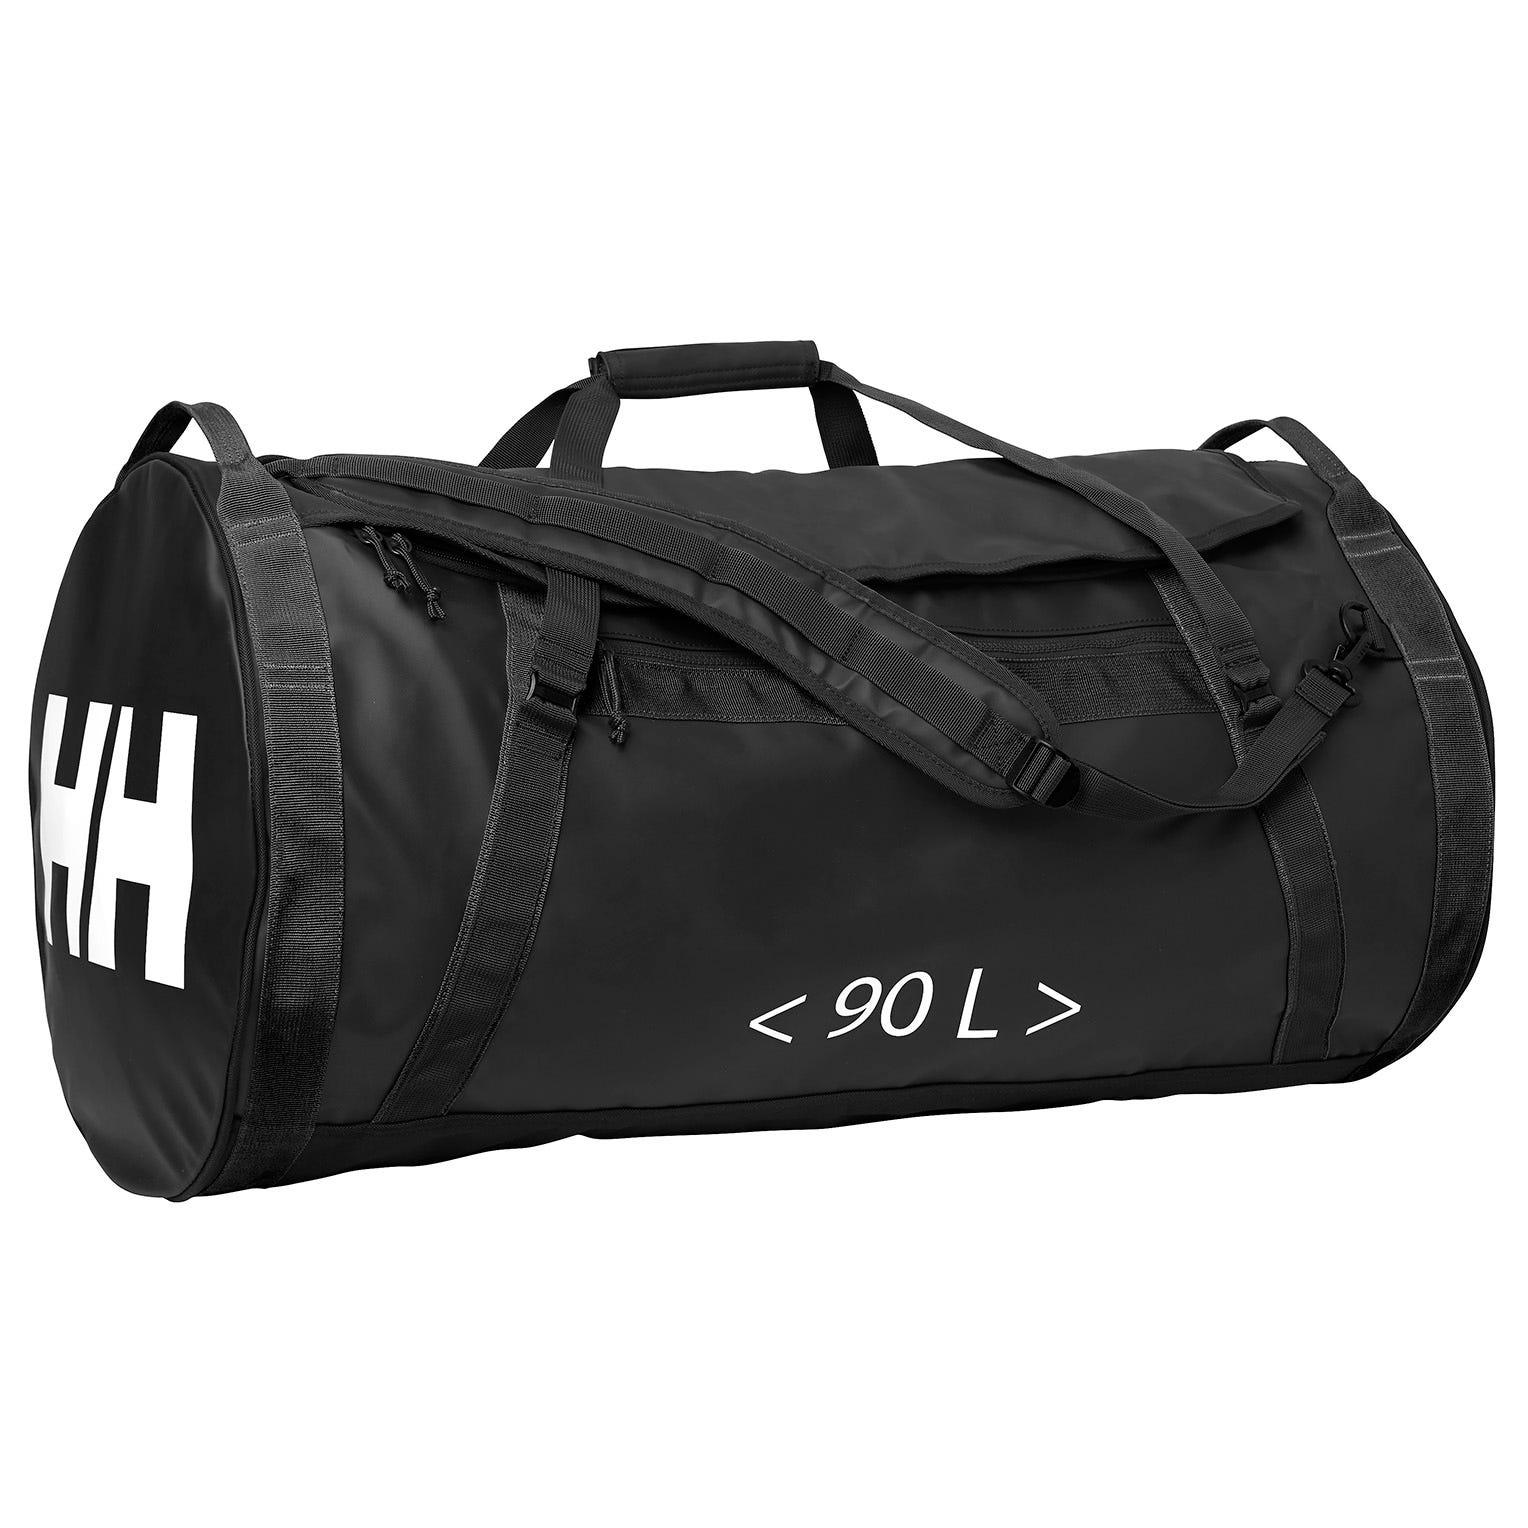 Helly Hansen Duffelbag 2 90l Svart STD